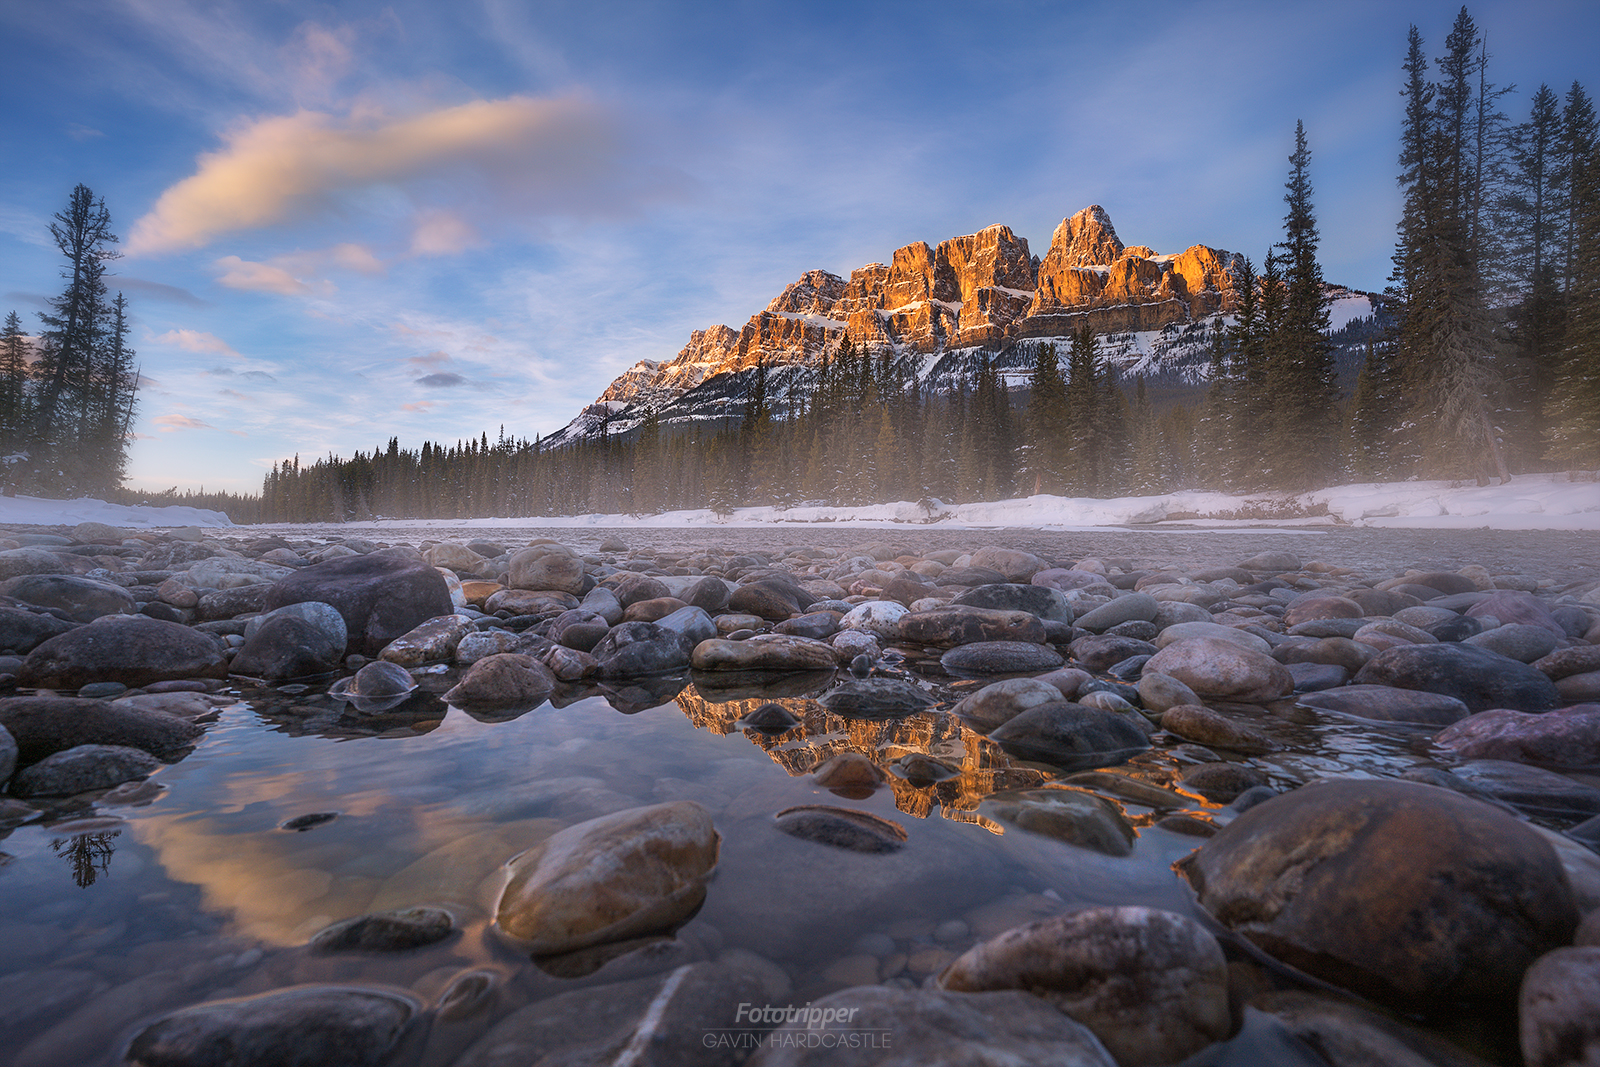 Castle Mountain - Banff Photography Workshop with Gavin Hardcastle